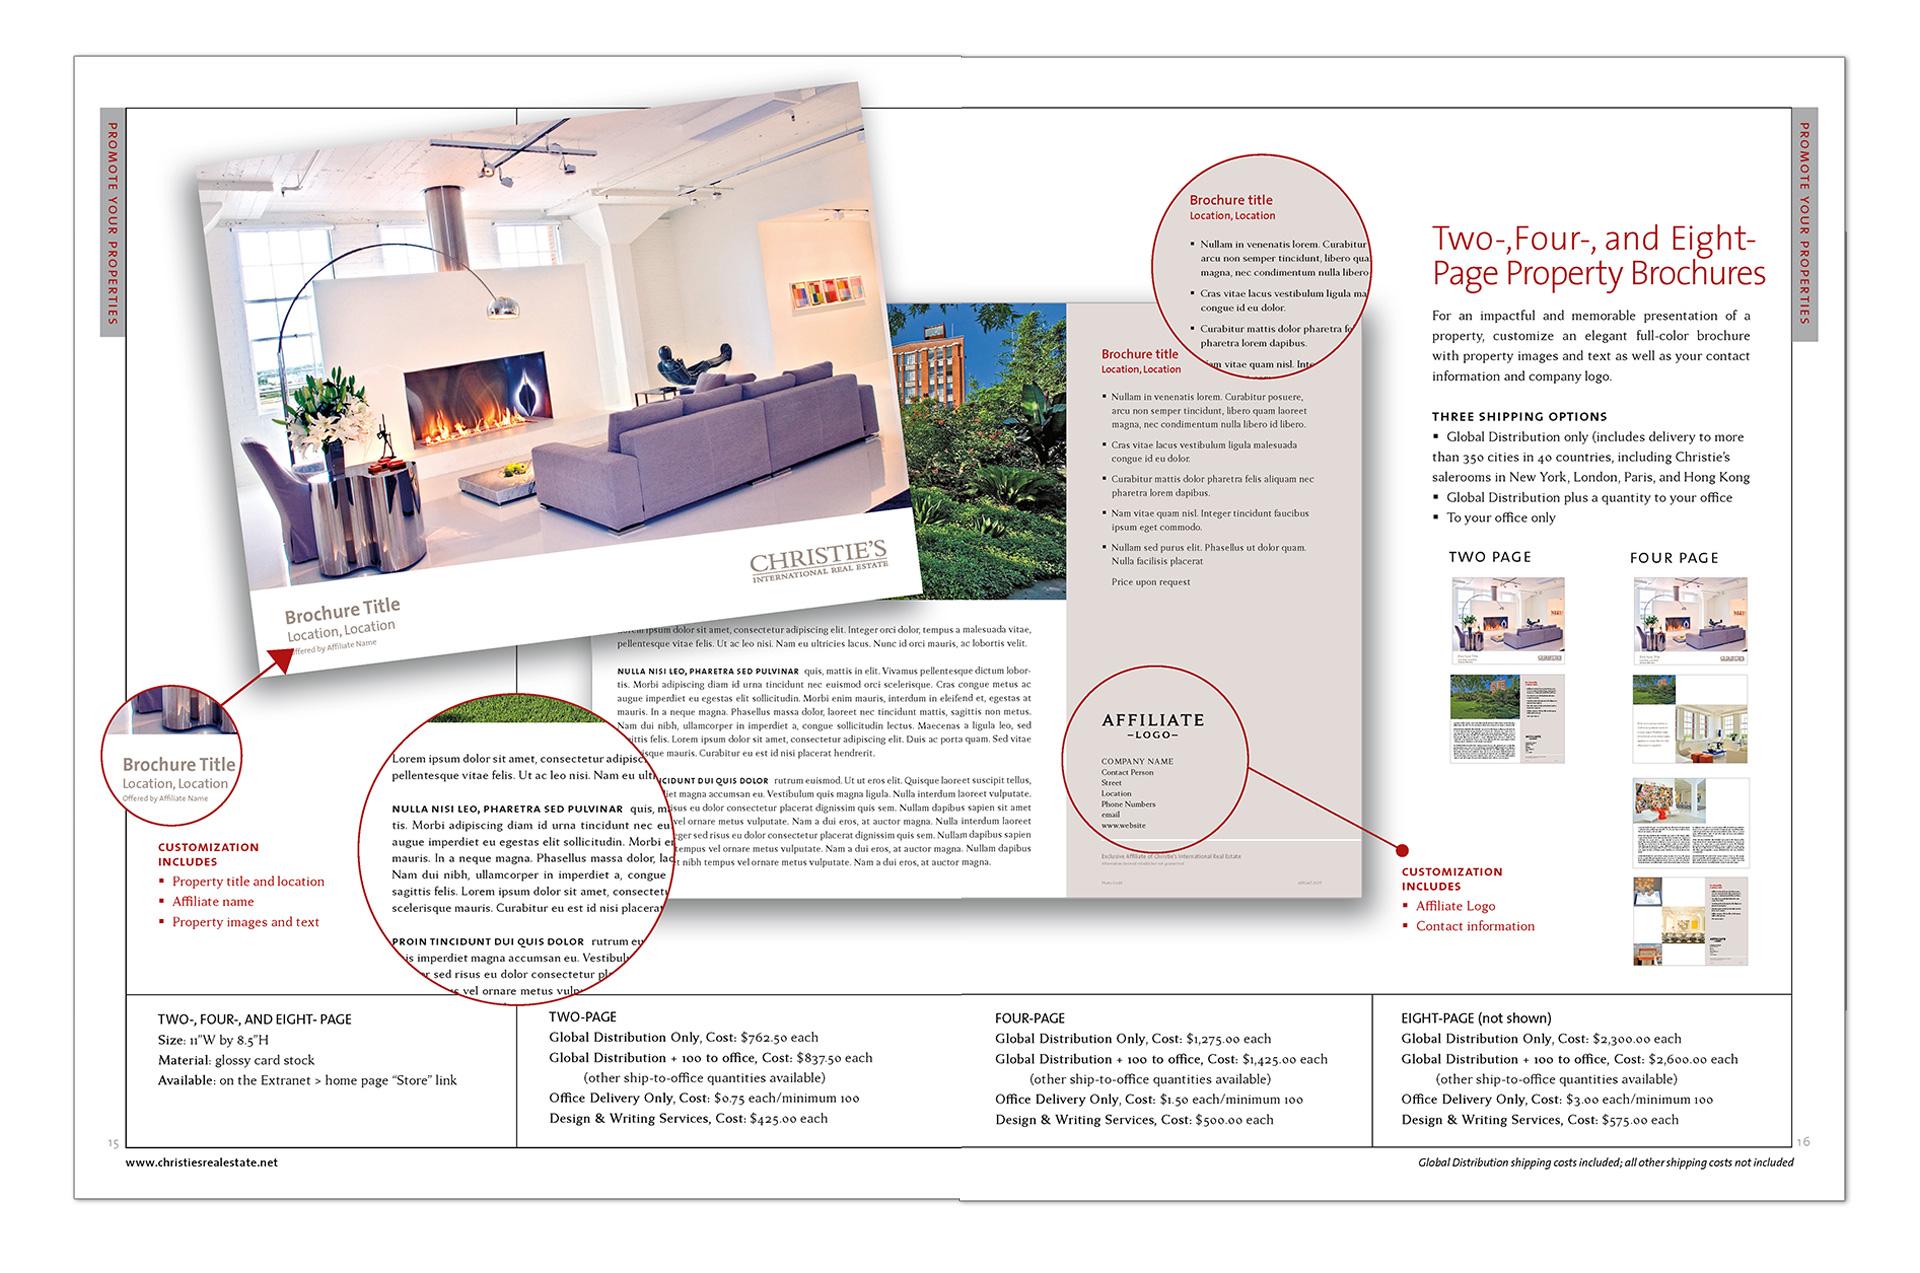 Christies-International-Real-Estate-Branding-Guide-Spread